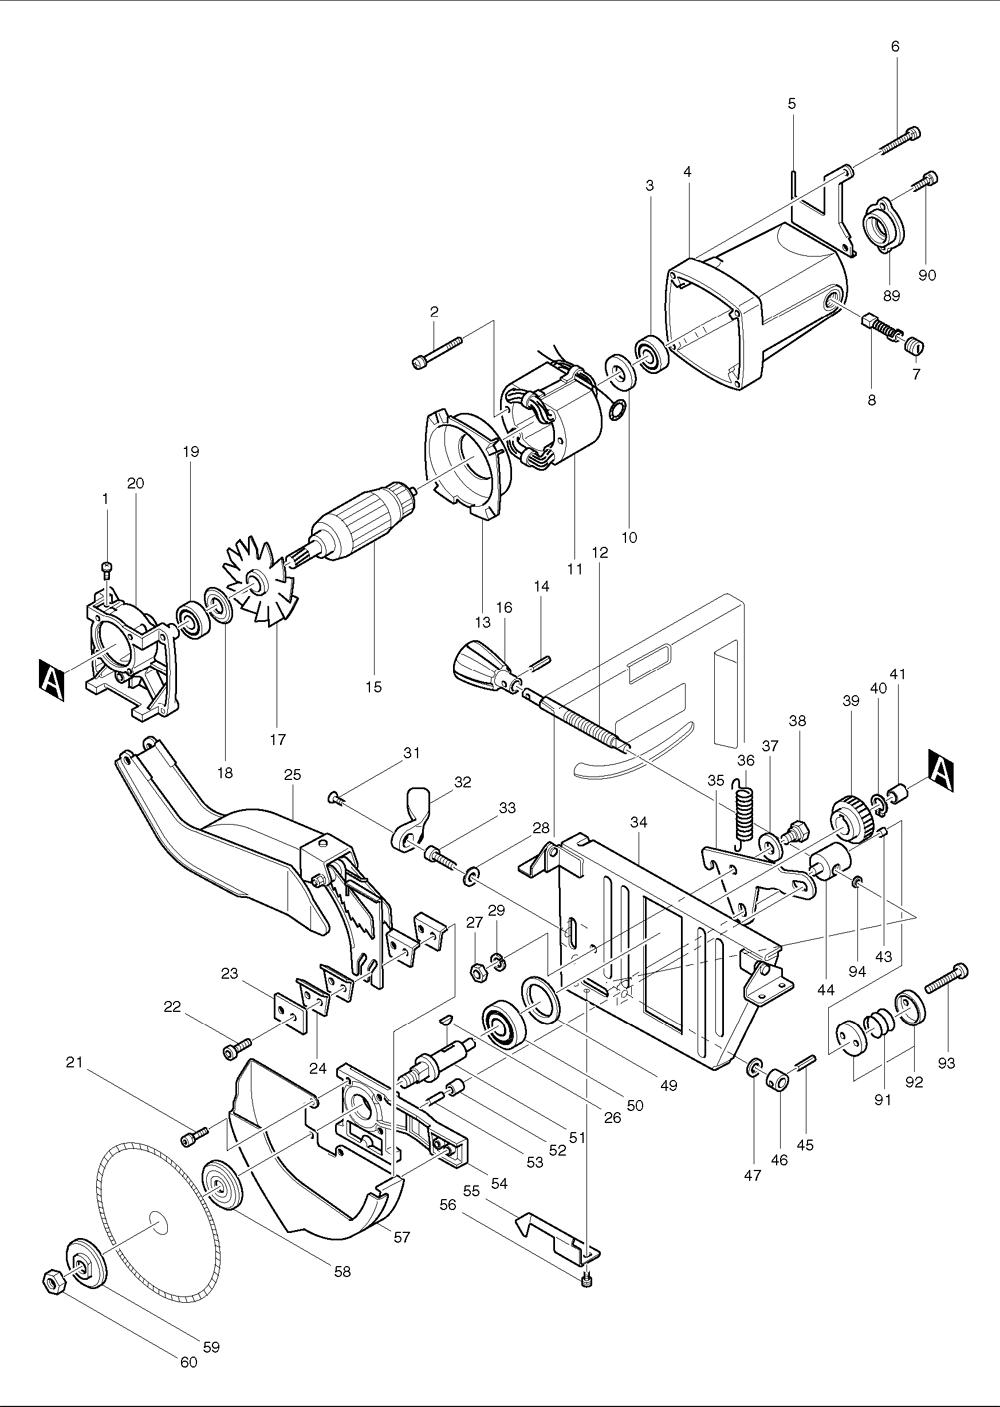 makita table saw 2711 wiring diagram custom wiring diagram u2022 rh littlewaves co  makita table saw switch wiring diagram